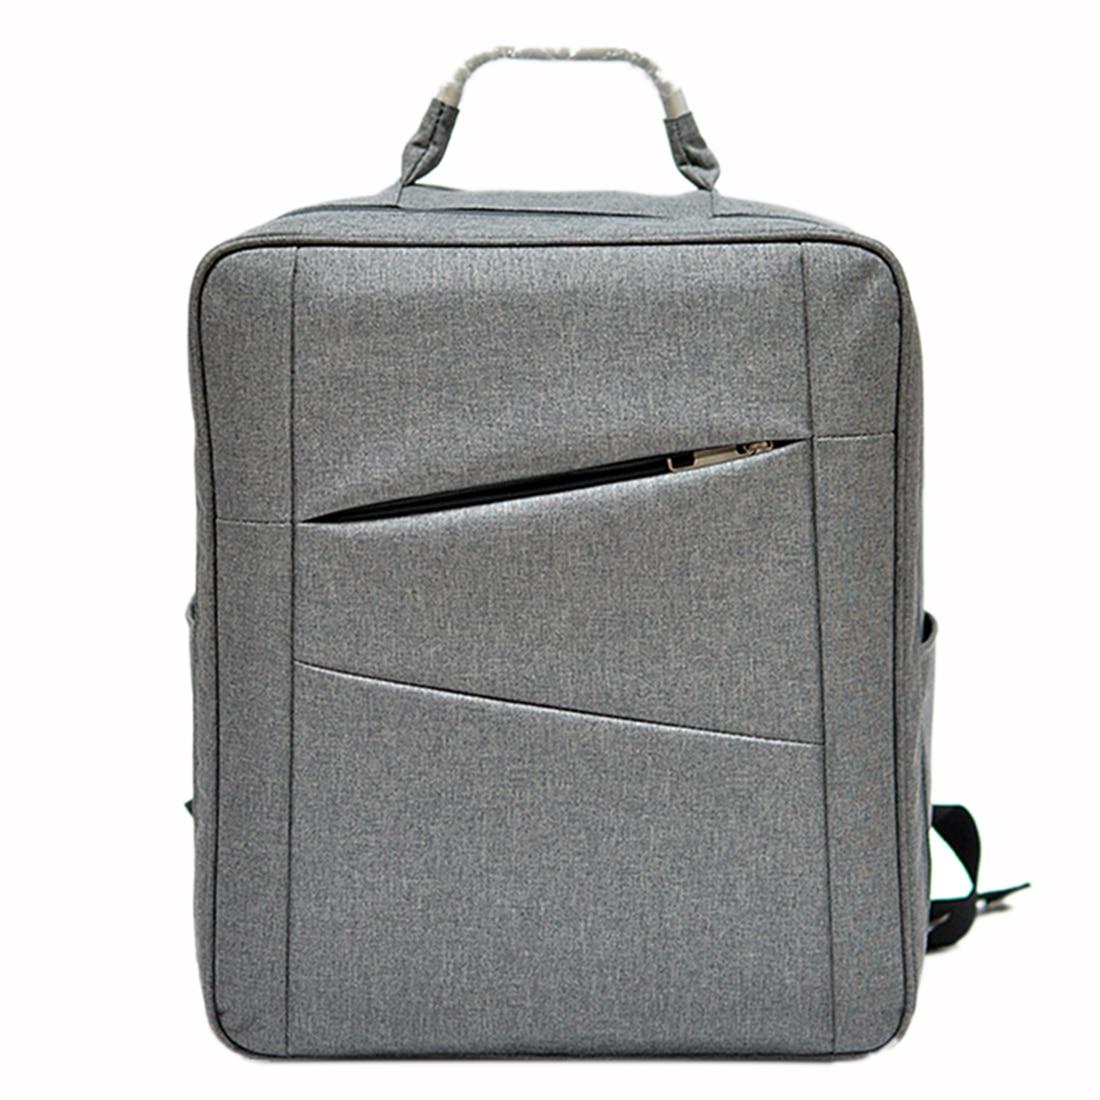 лучшая цена General Carrying Case Storage Bag Multicopter Backpack for DJI Phantom 4/pro/Phantom 4 Advanced/Phantom 4 Pro V2.0 - Grey